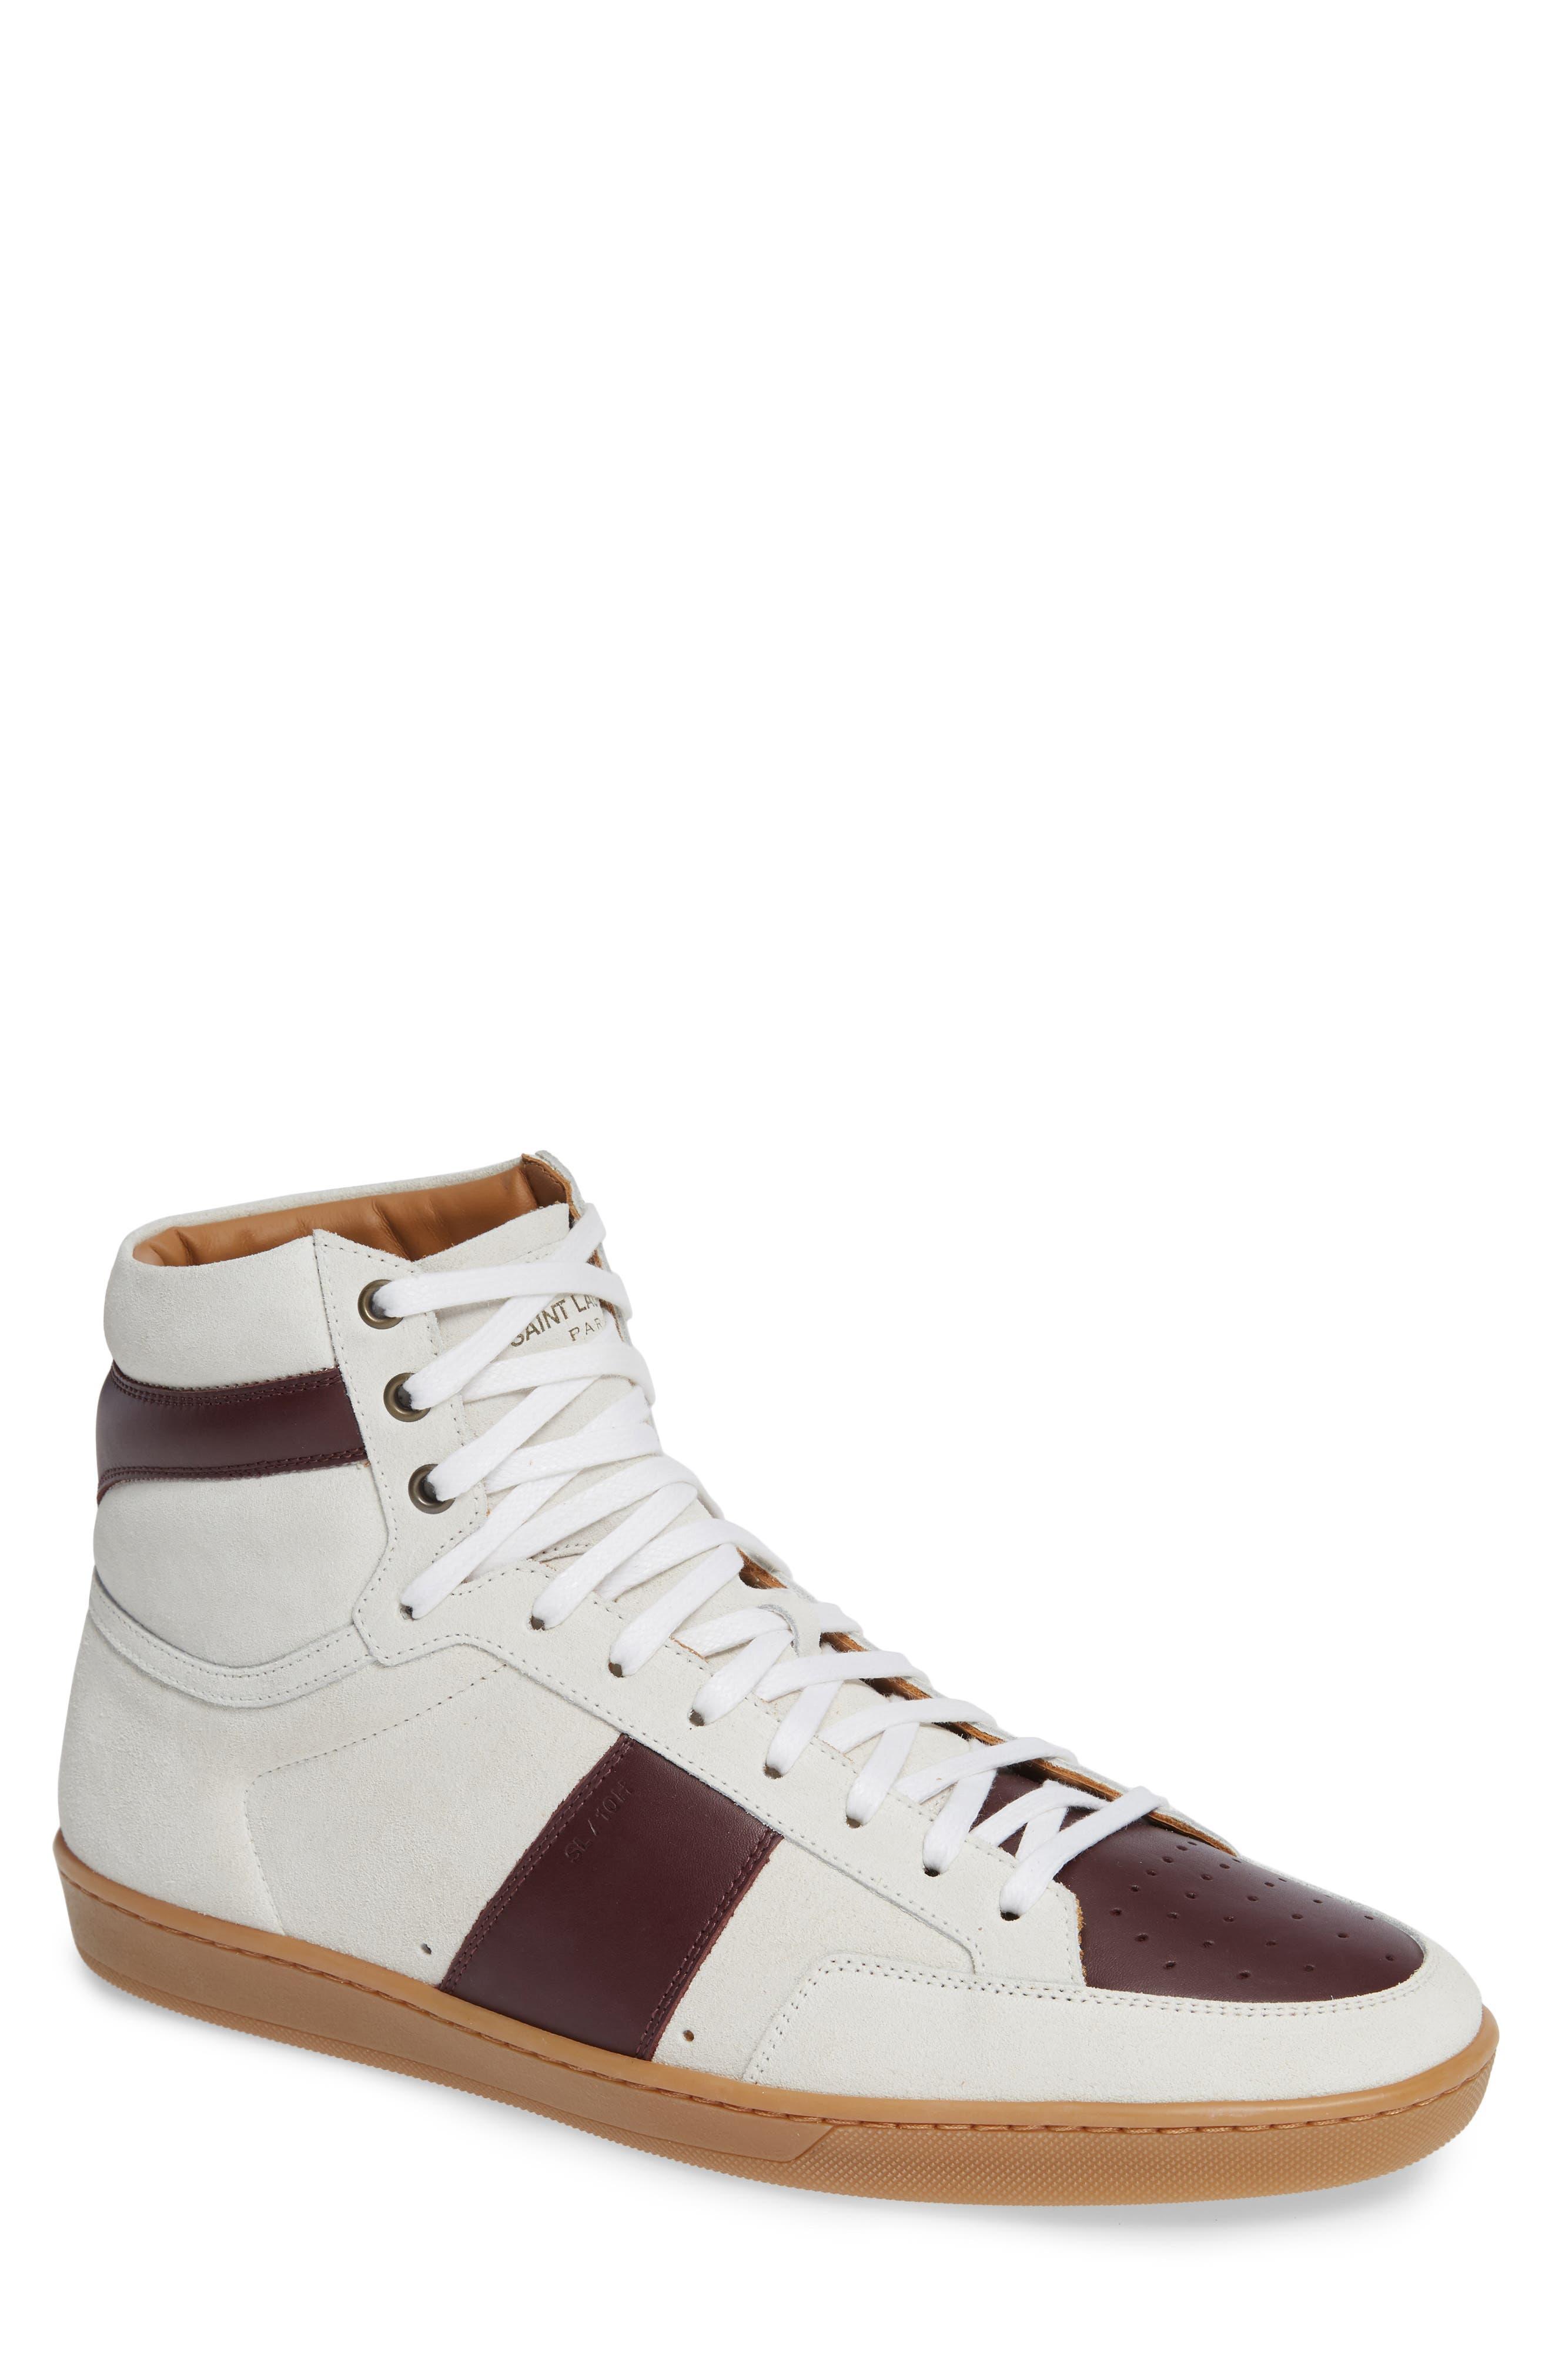 SL/10H Signature Court Classic High-Top Sneaker,                         Main,                         color, Milk/ Barolo